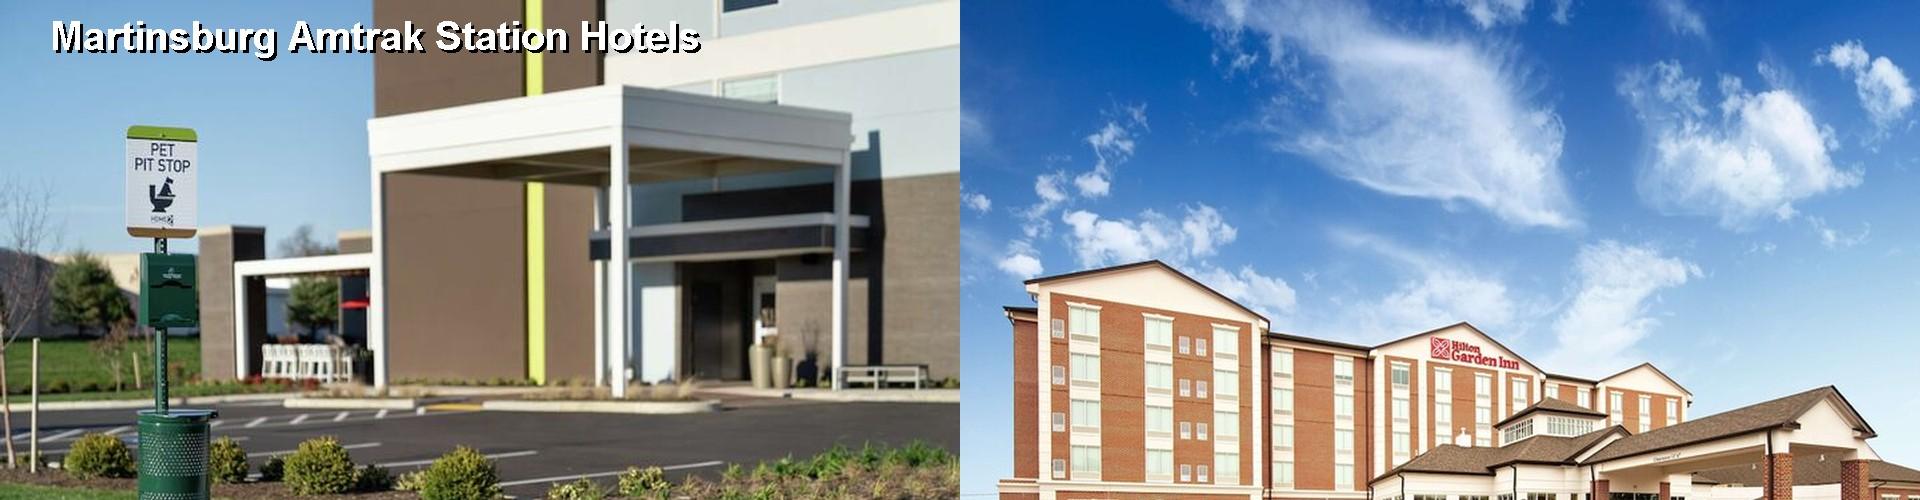 5 Best Hotels Near Martinsburg Amtrak Station